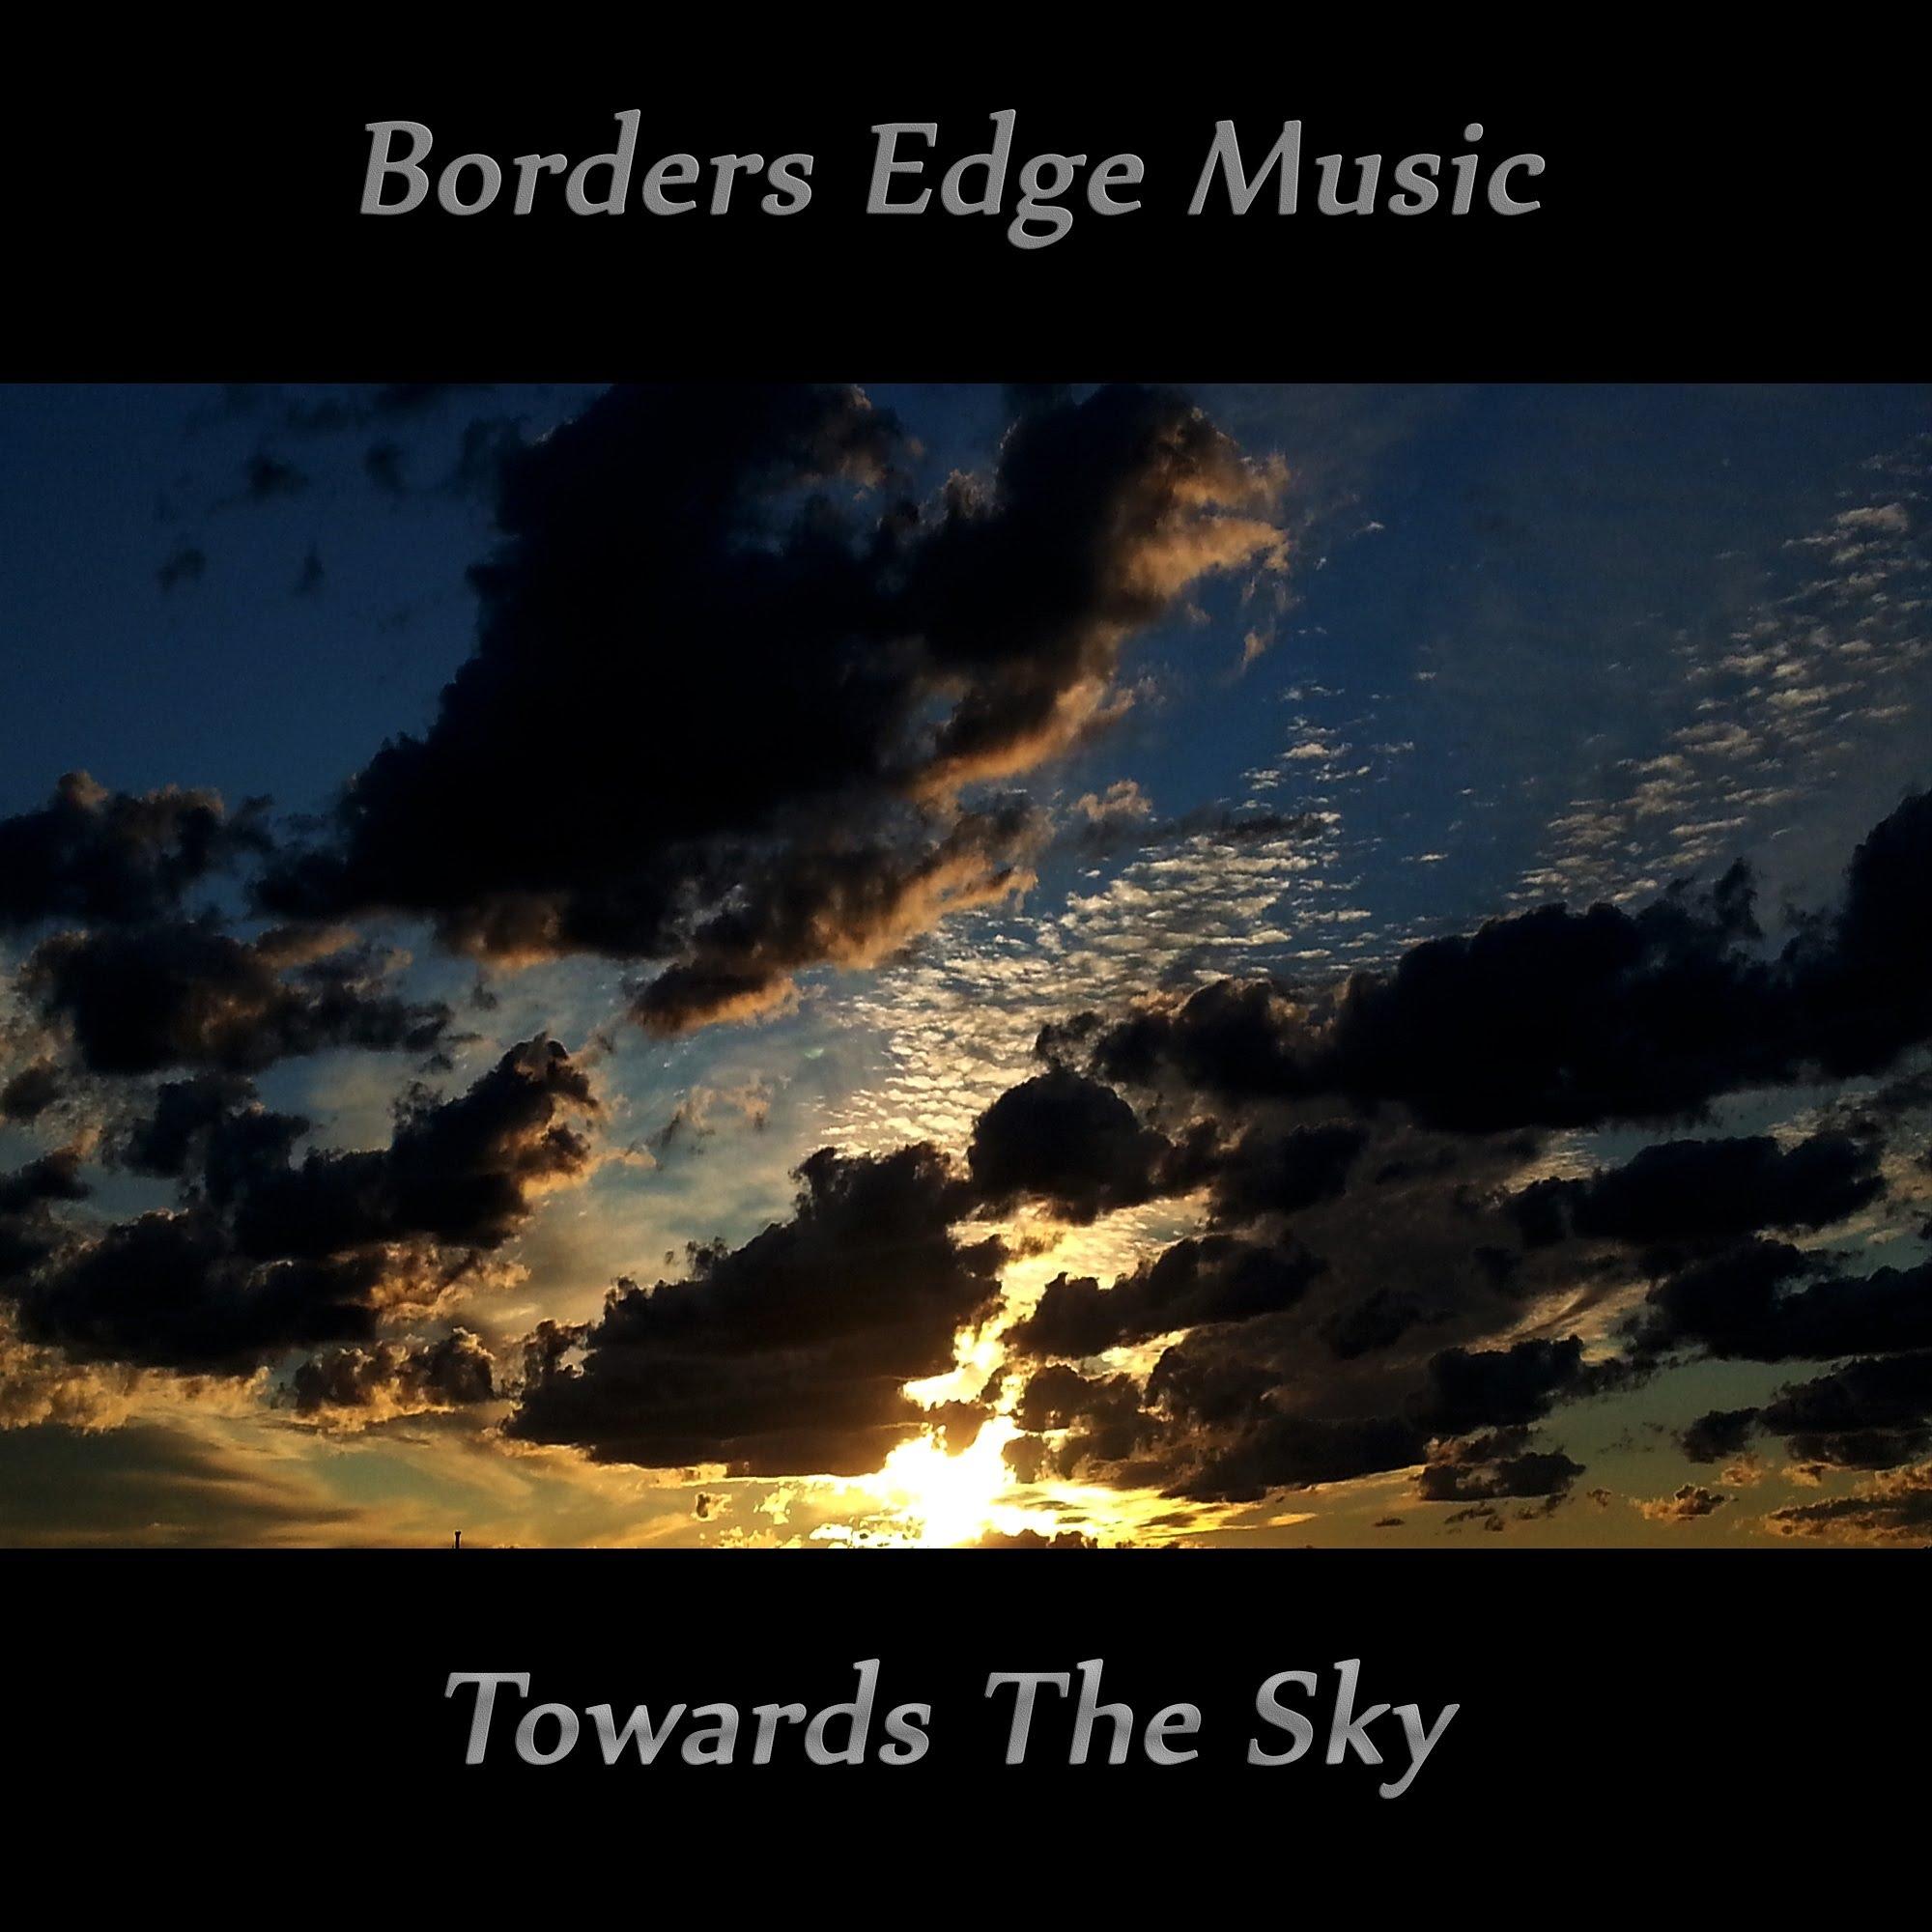 https://bordersedge.bandcamp.com/album/towards-the-sky